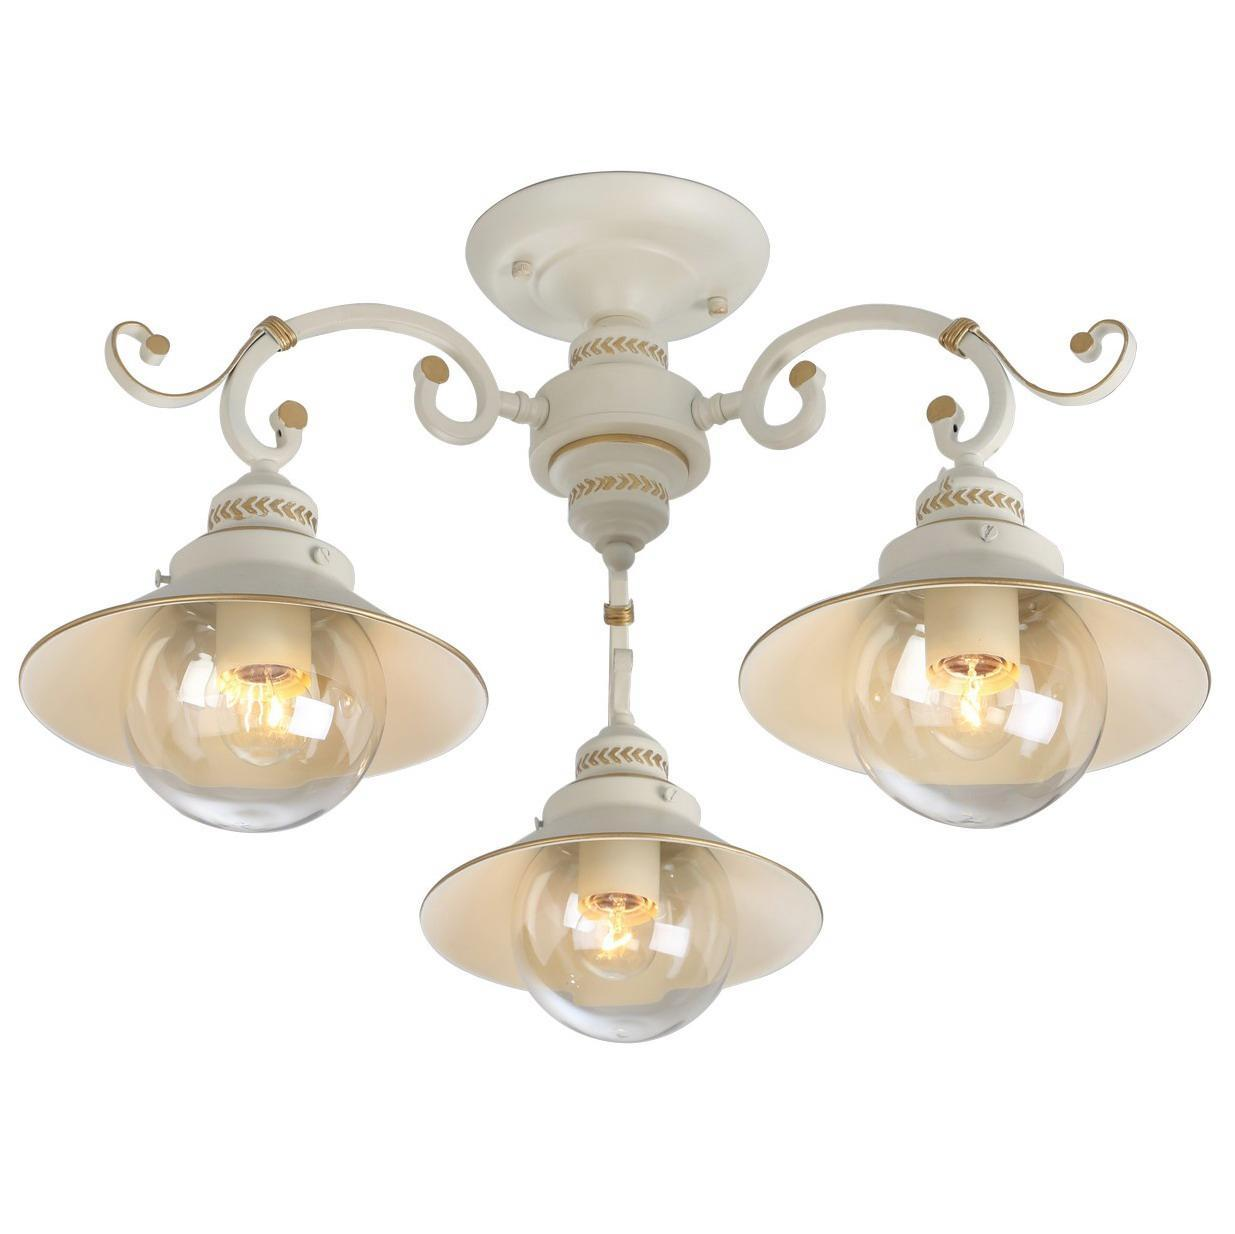 Люстра Arte Lamp 7 A4577PL-3WG потолочная потолочная люстра arte lamp 7 a4577pl 8wg